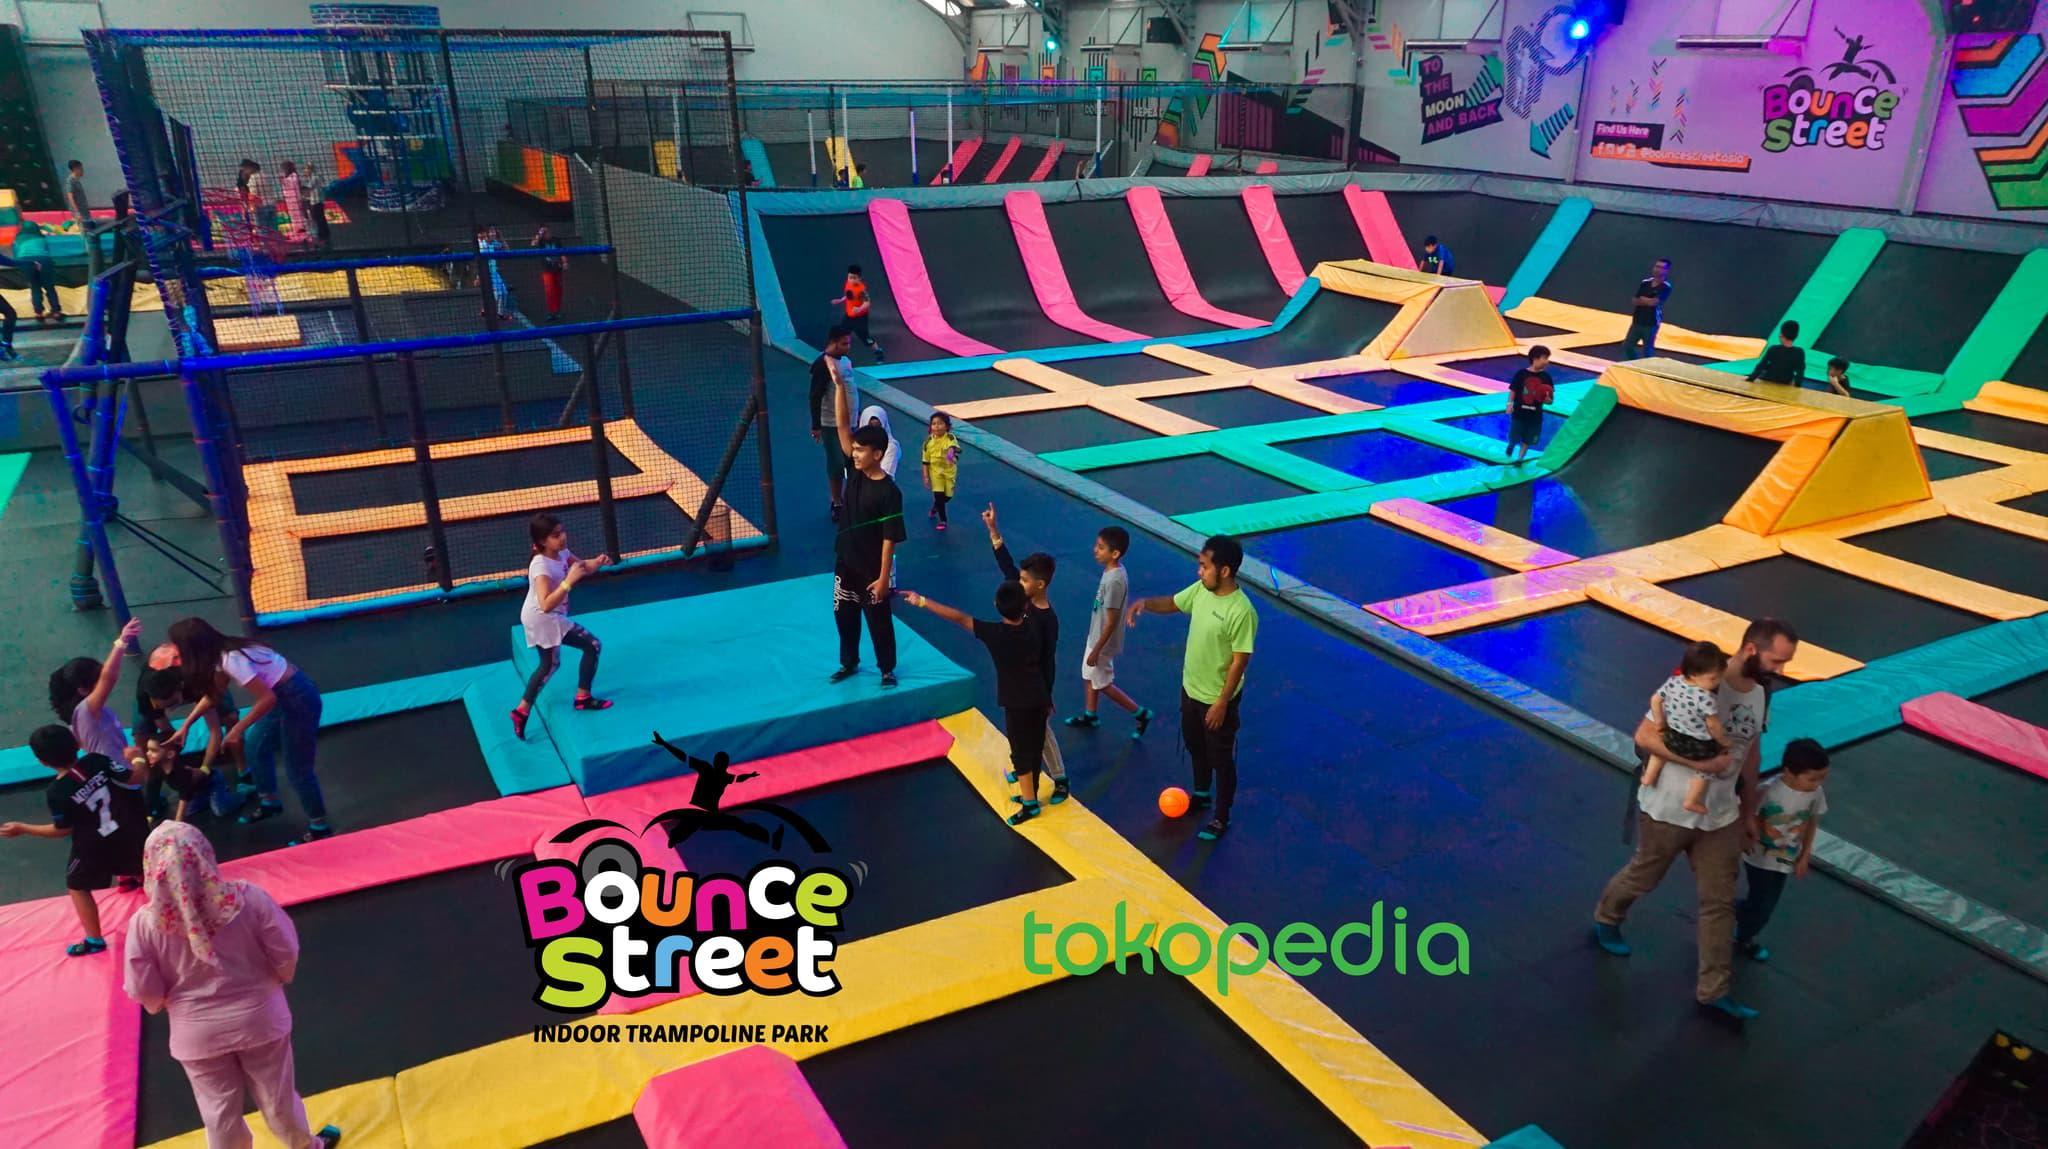 bounce street asia trampoline park jakarta